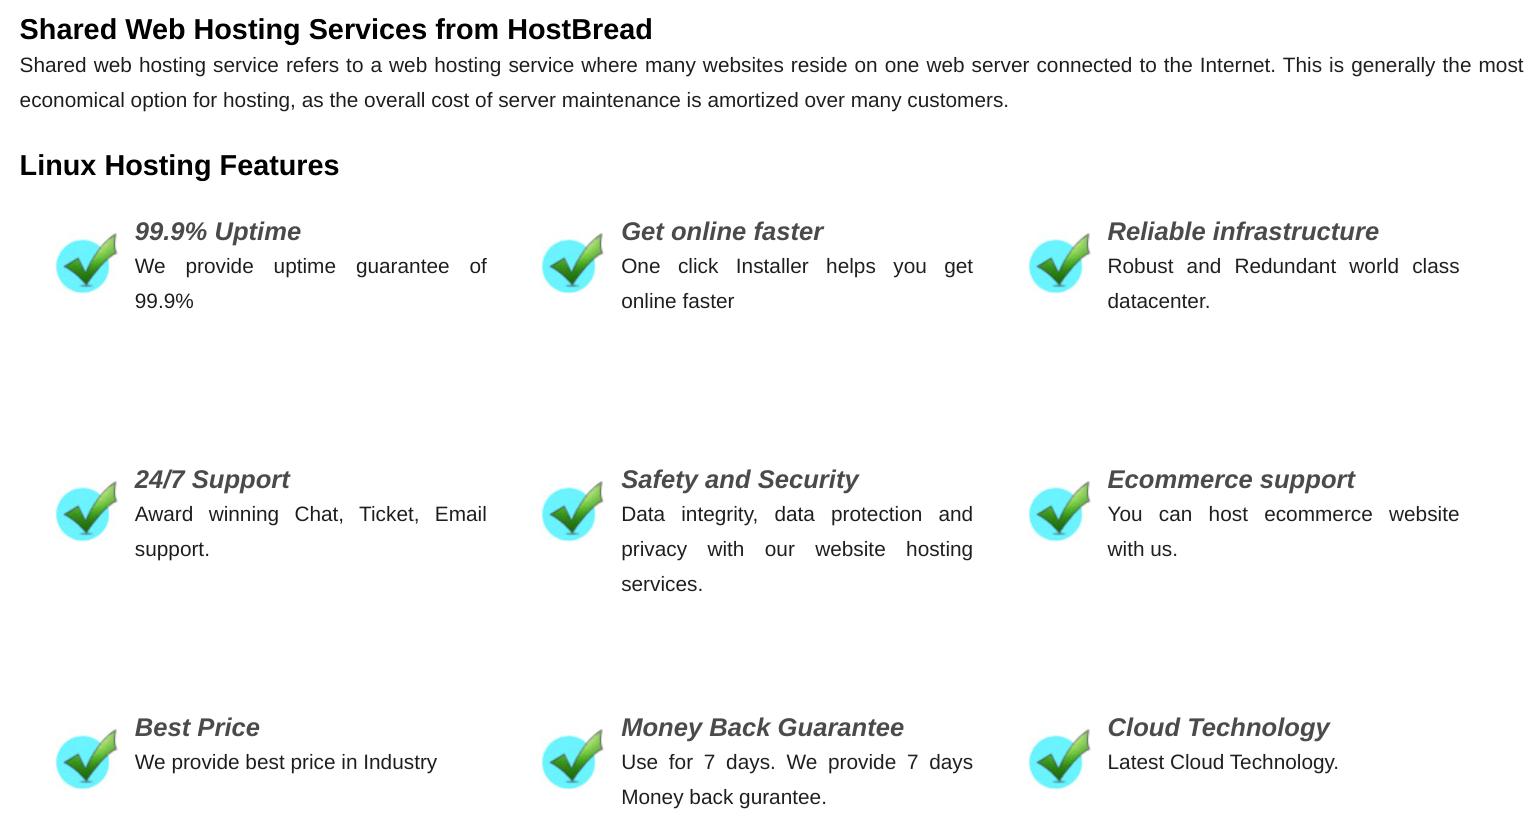 HostBread